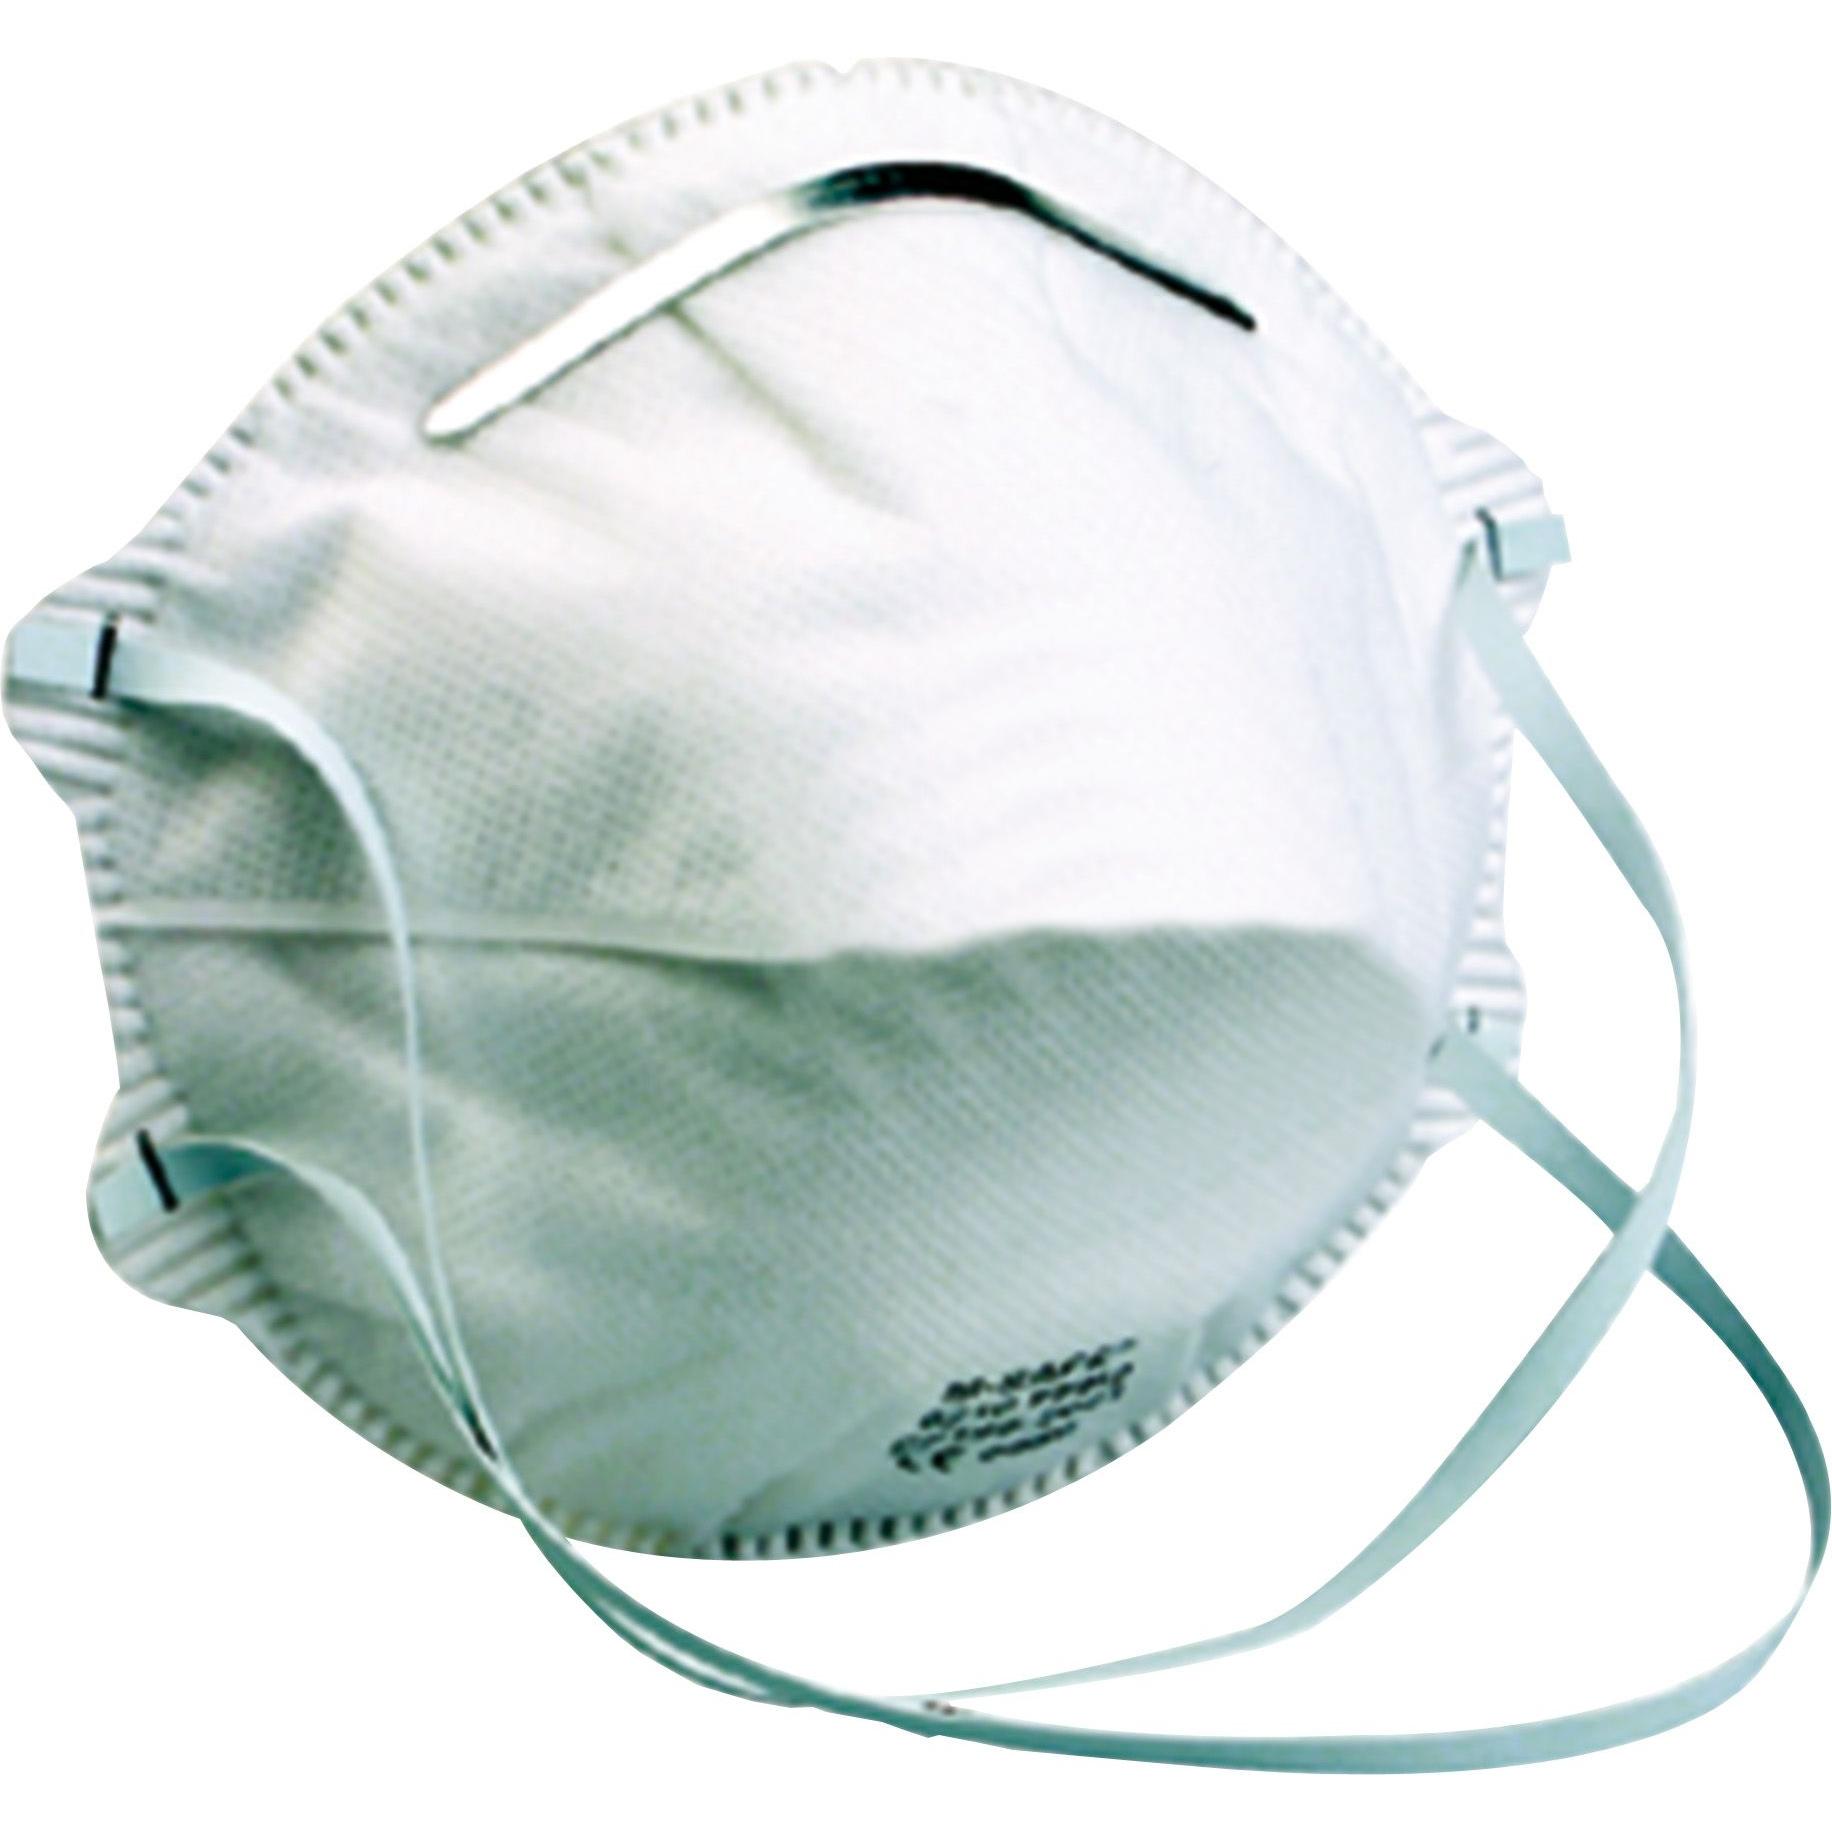 Mondmaskers FFP1 ZONDER ventiel – Bescherming Coronavirus / Griepvirus